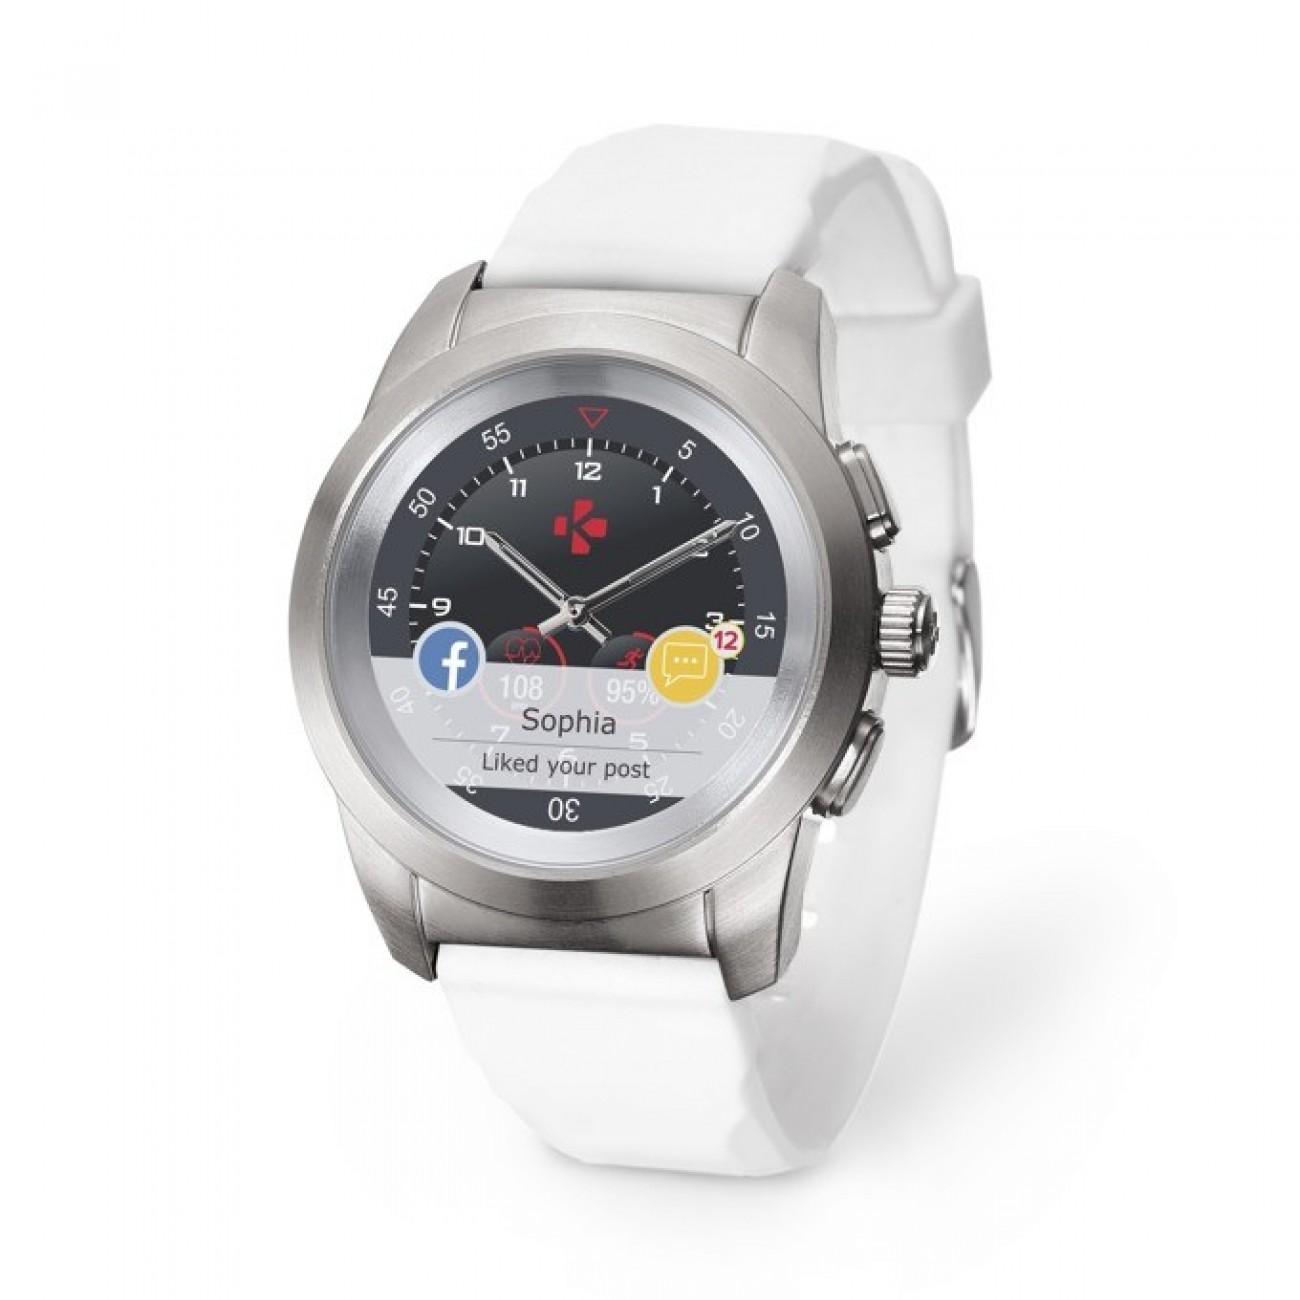 Хибриден смарт часовник MyKronoz ZeTime Petite, механични стрелки, 1.22 (3.09 cm) TFT сензорен дисплей, Bluetooth 4.2, до 3 дни време за работа в режим Smart, водоустойчив, сребрист-бял в Смарт часовници - MyKronoz | Alleop